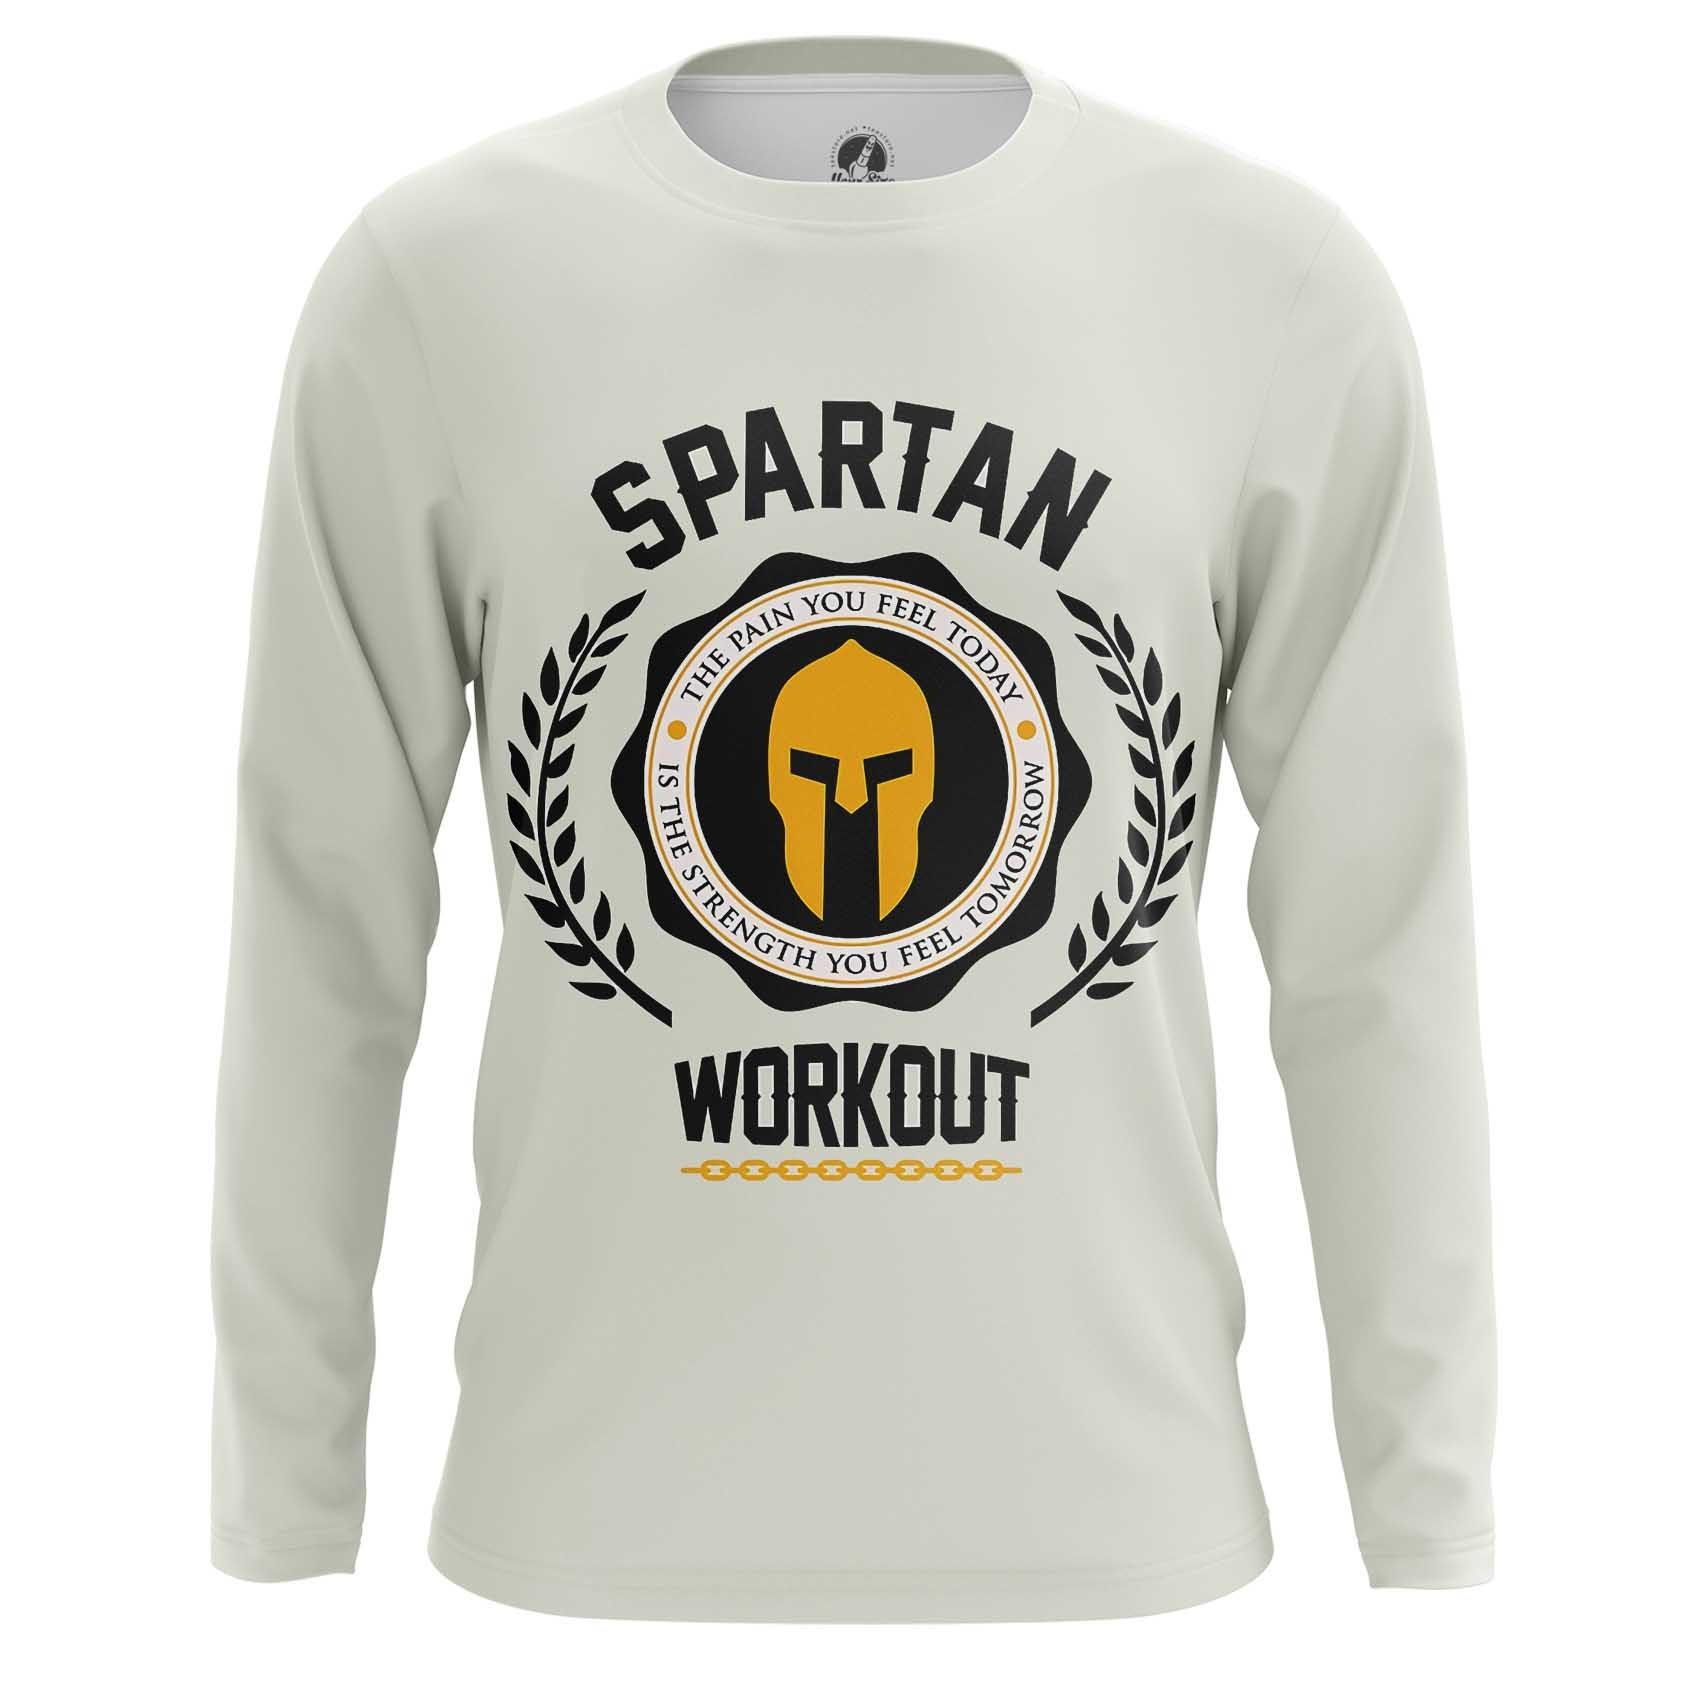 Merchandise Raglan Spartan Workout